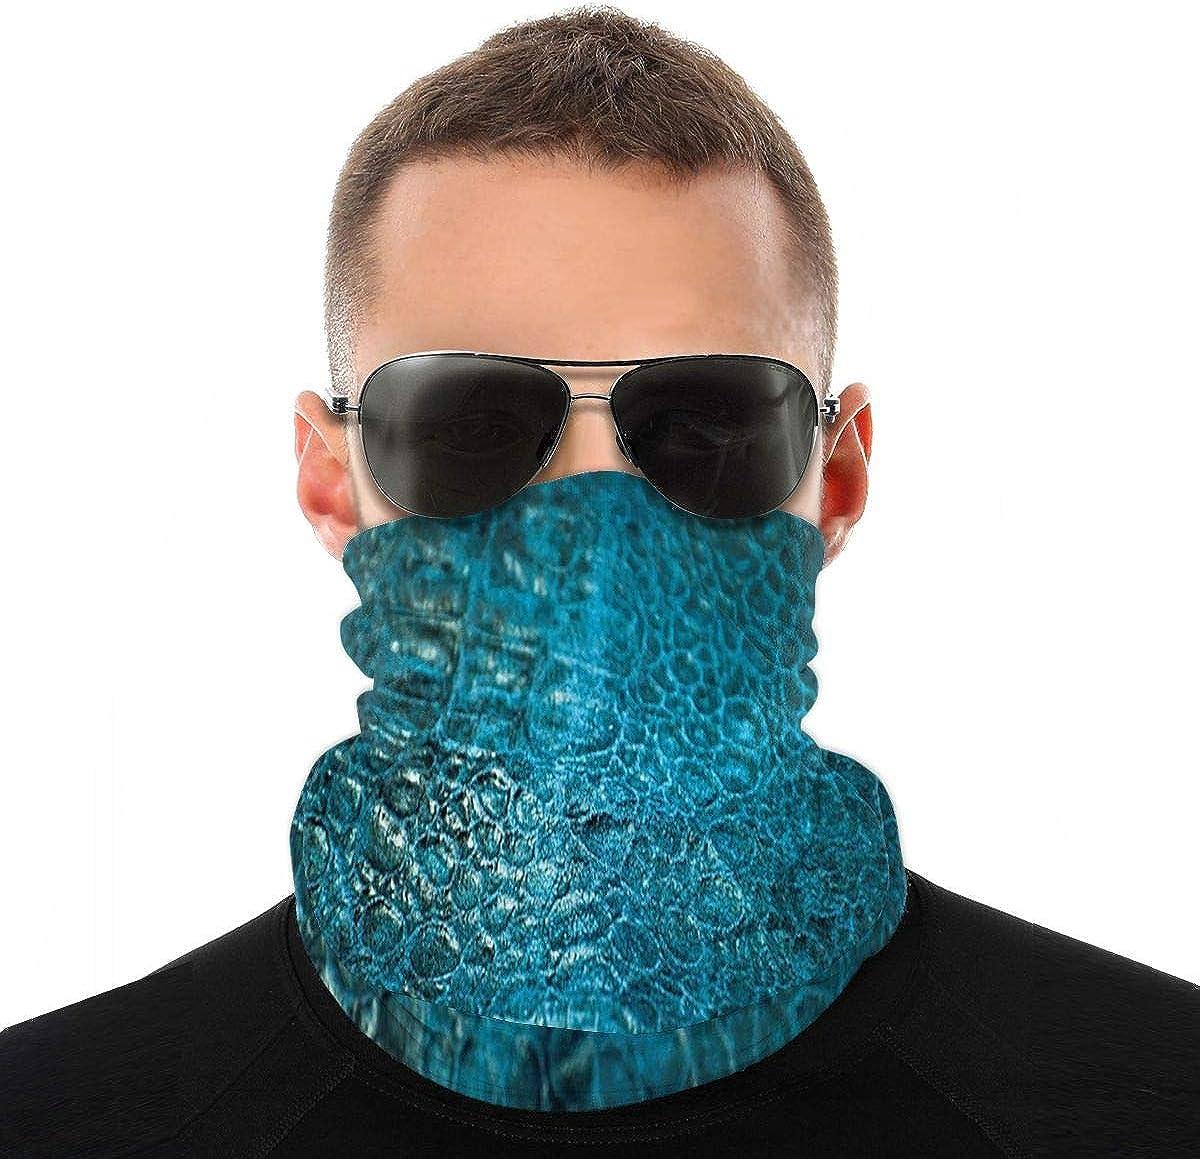 Kiuloam Bandanas Face Mask, Fish Skin Print Neck Gaiter Mask Headband for Men Women Face Scarf Dust, Outdoors, Sports